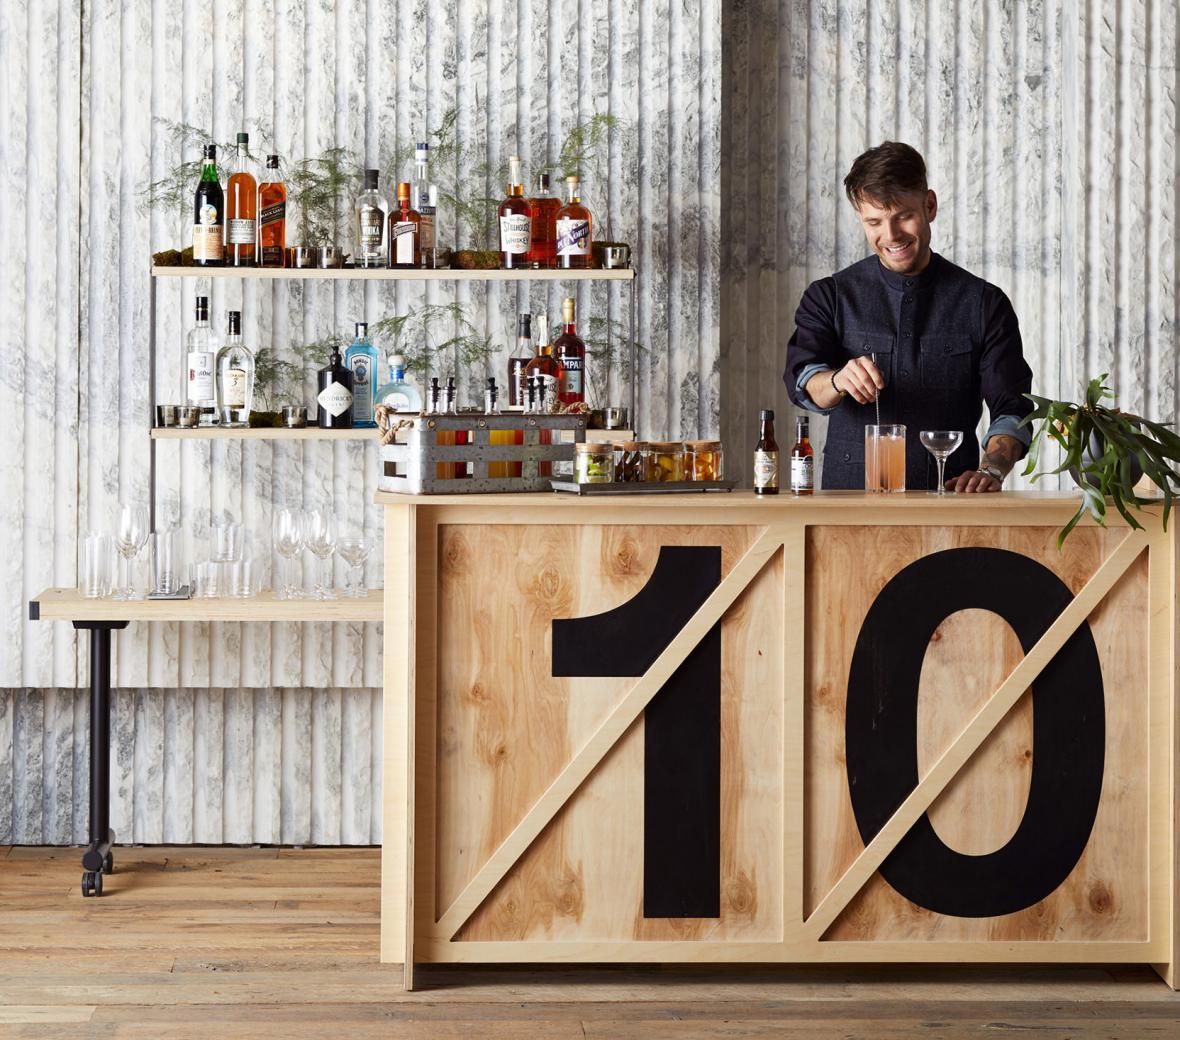 Bartender stirring cocktail